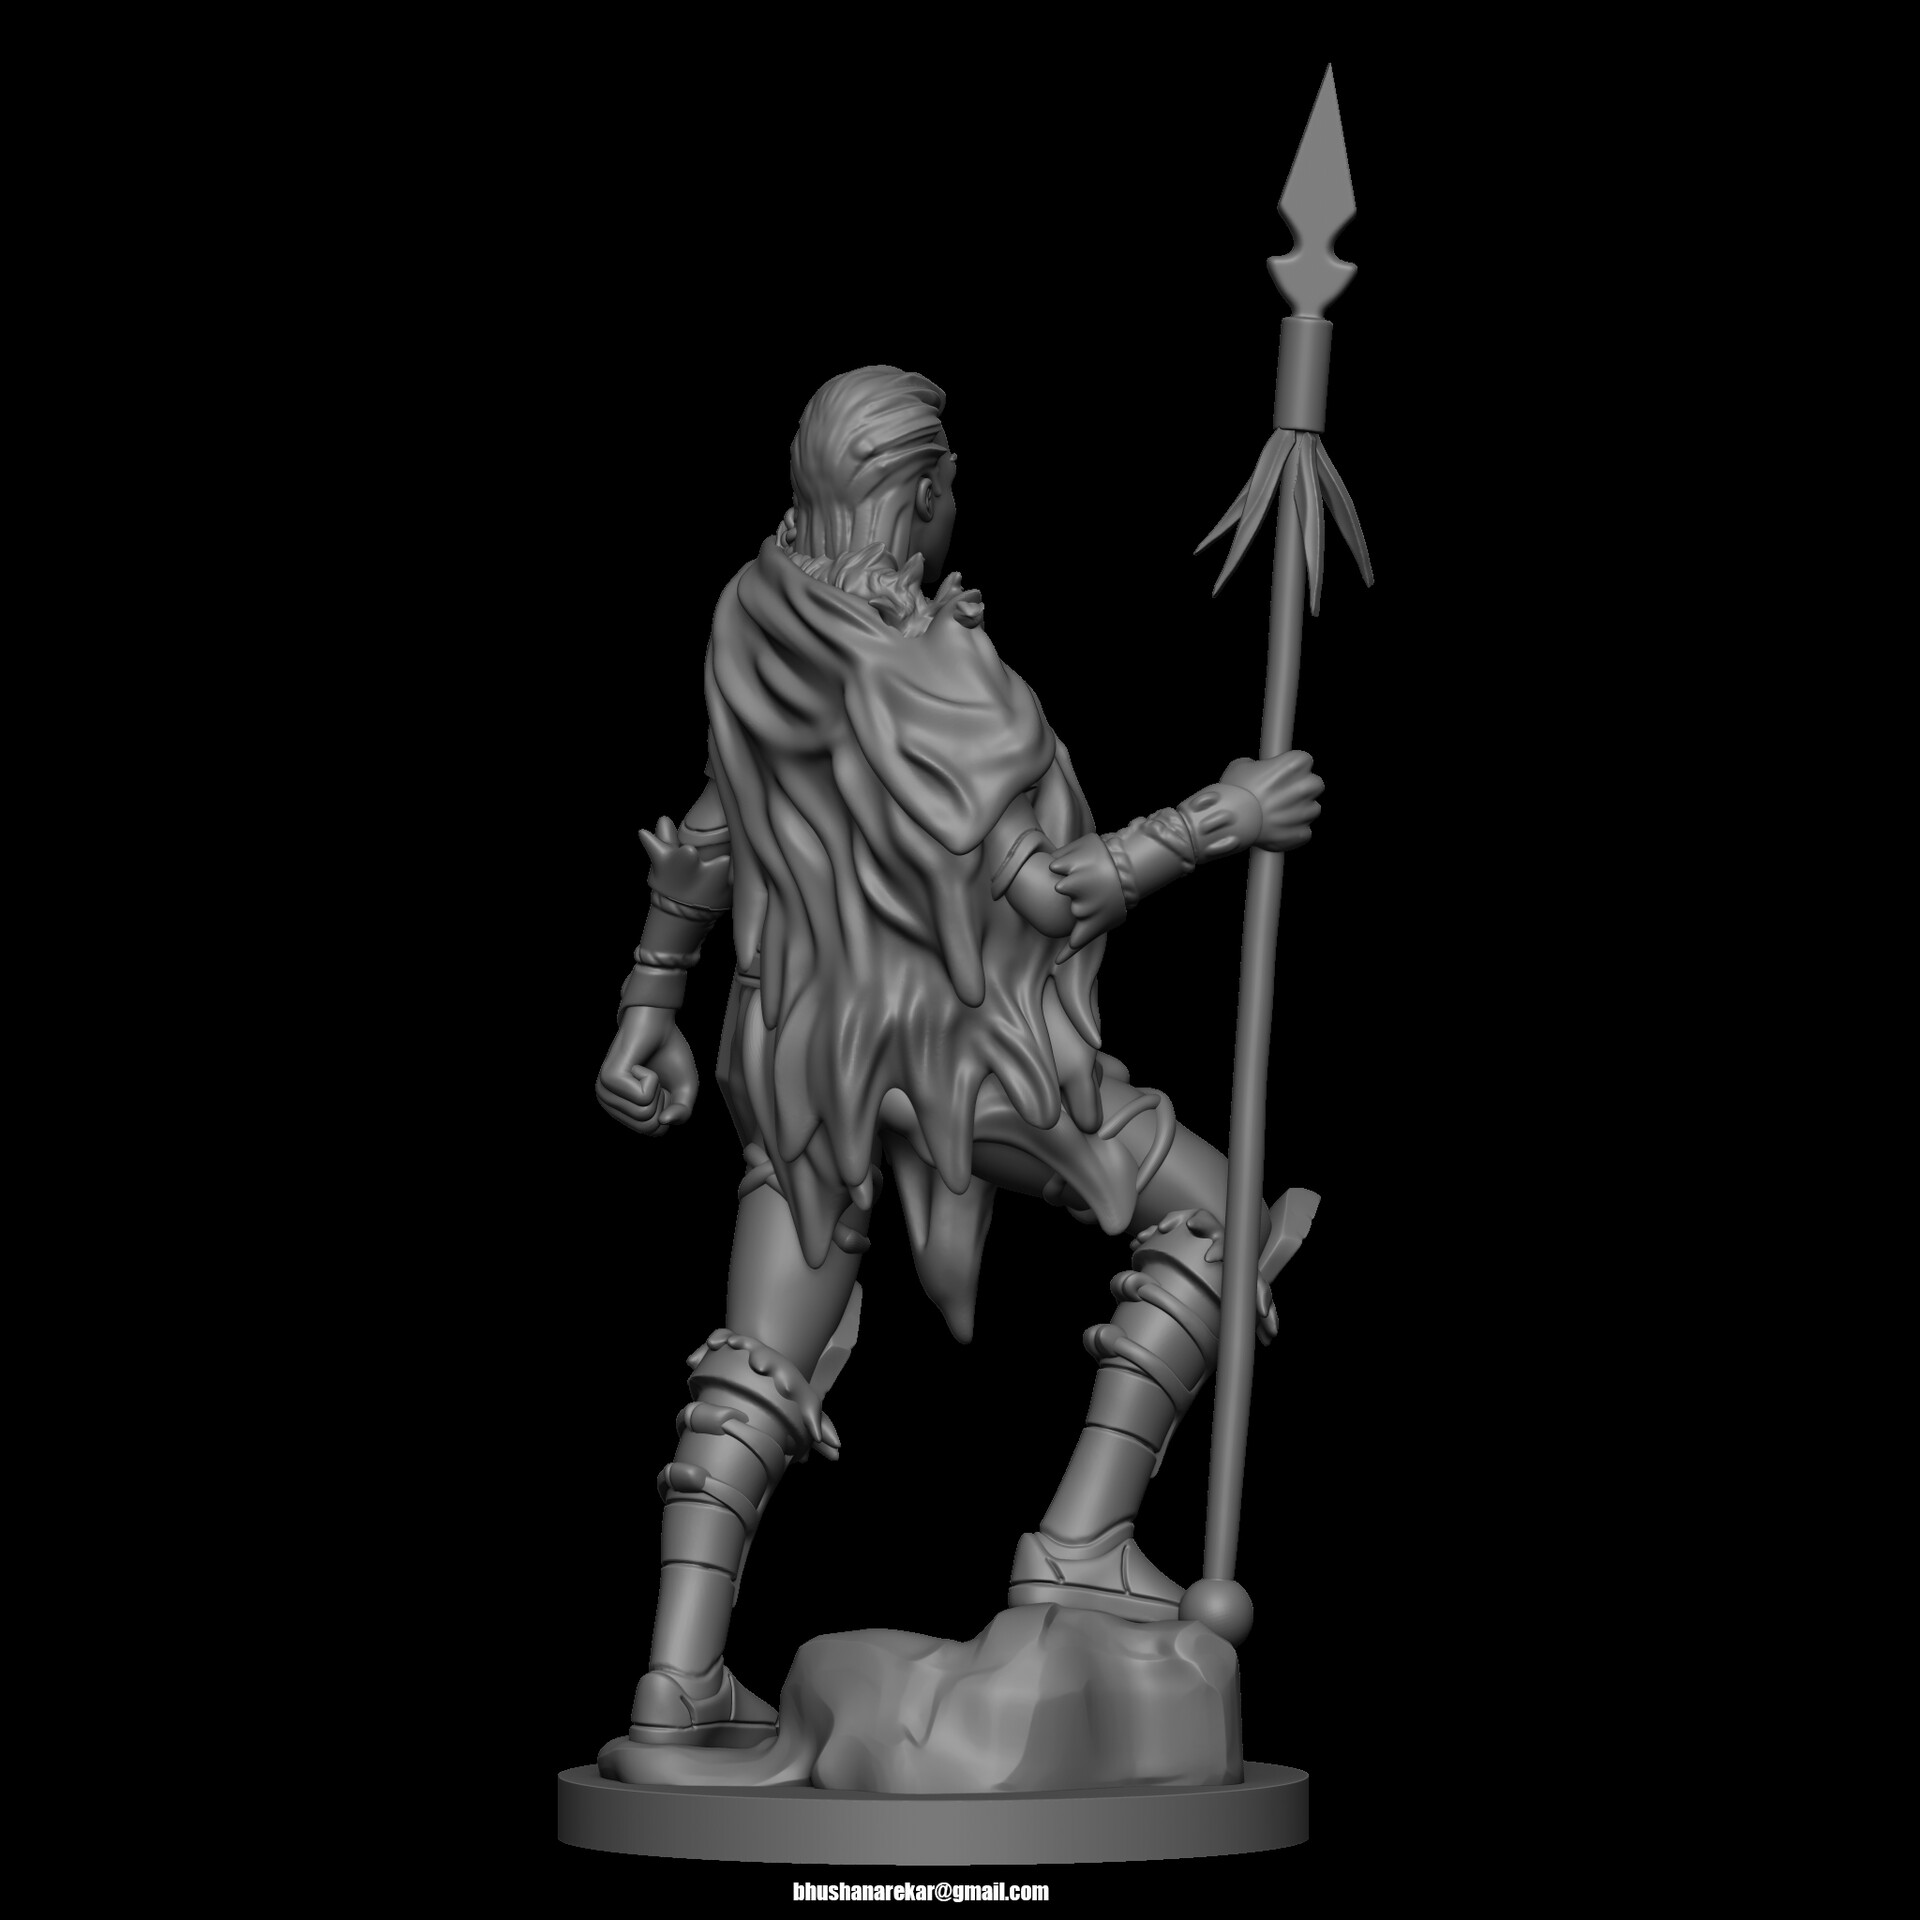 Bhushan arekar amazon warrior 3